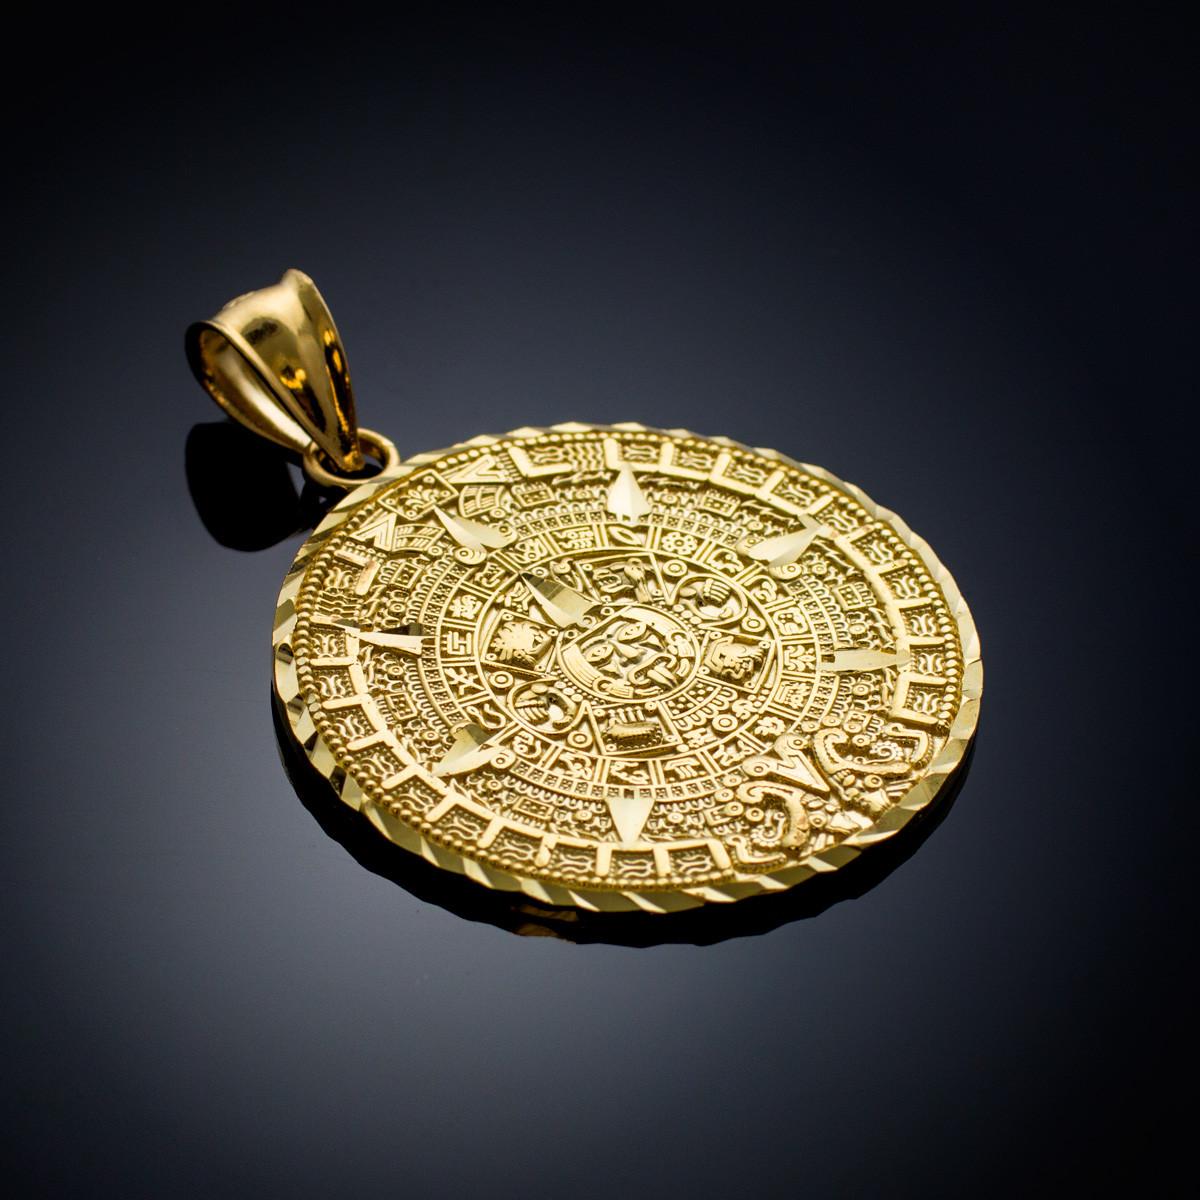 Gold Aztec Mayan Mexico Sun Calendar Pendant 3 Sizes Small Medium Large Ebay